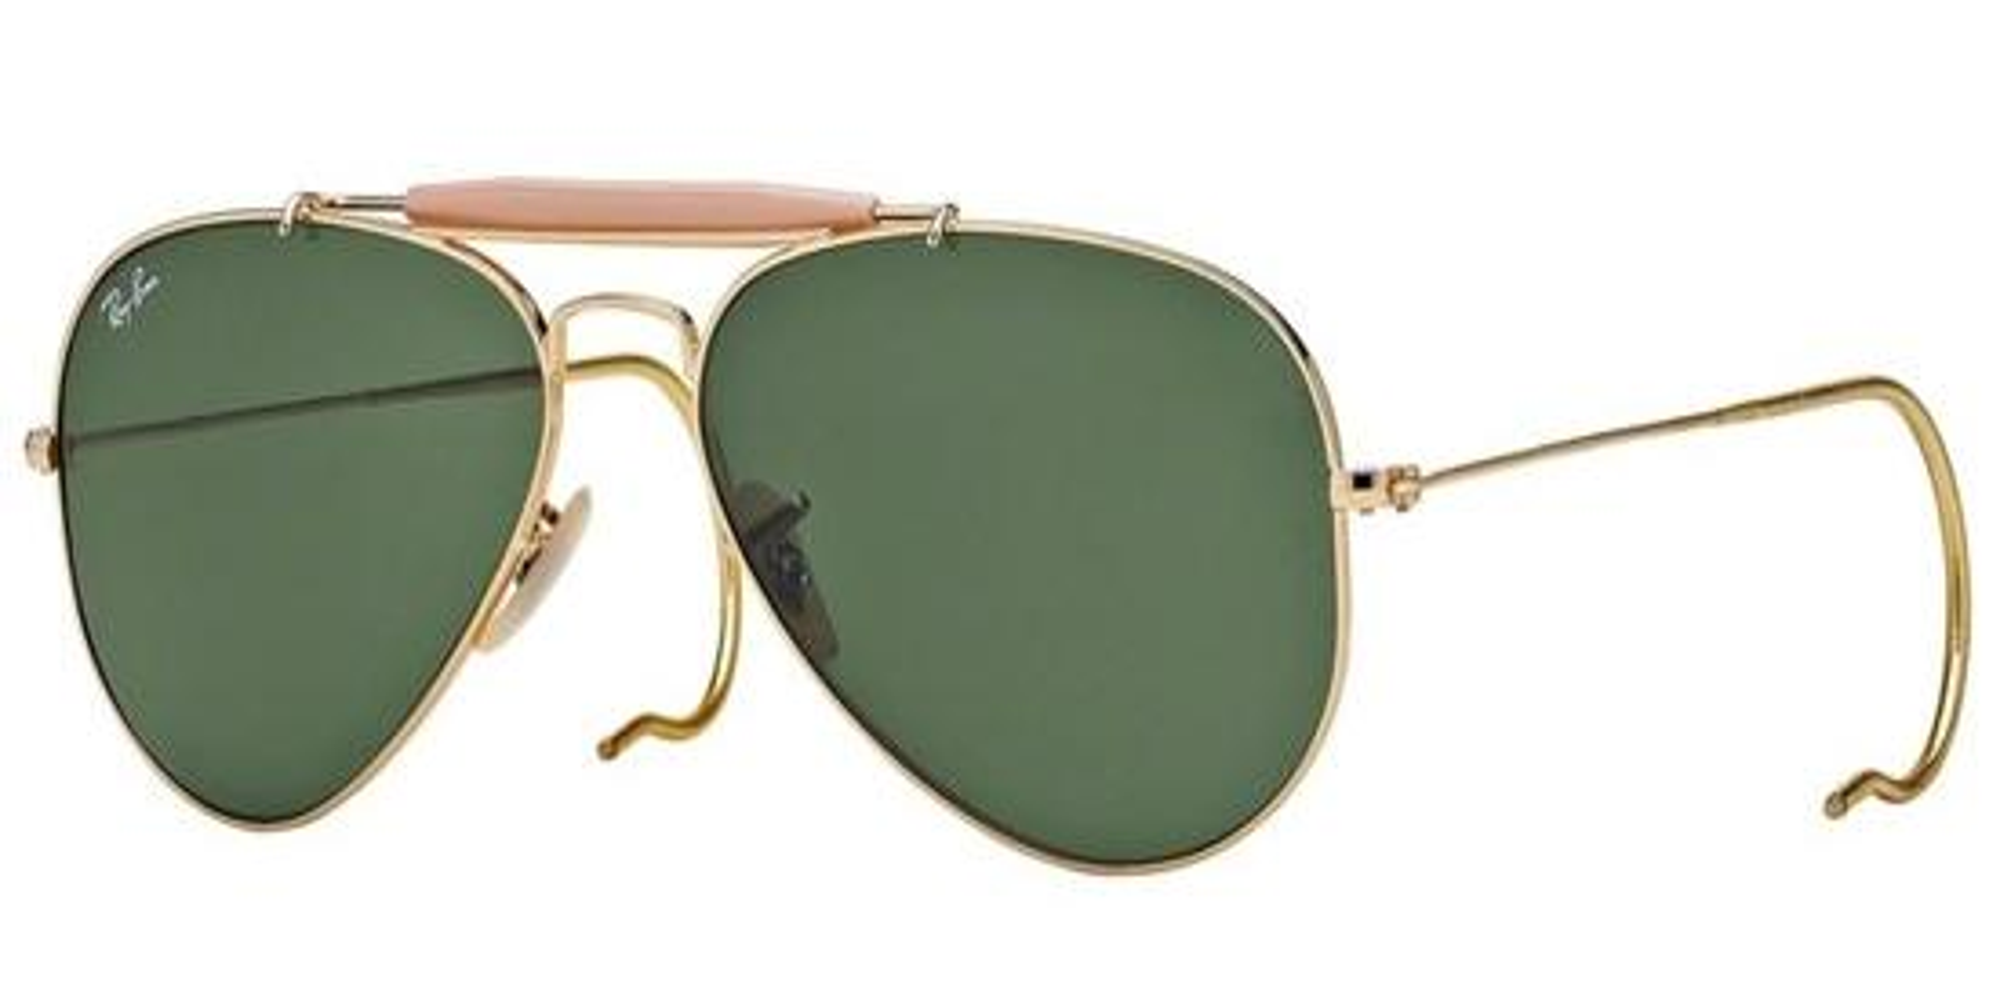 Ray-Ban solbriller OUTDOORSMAN I RB 3030